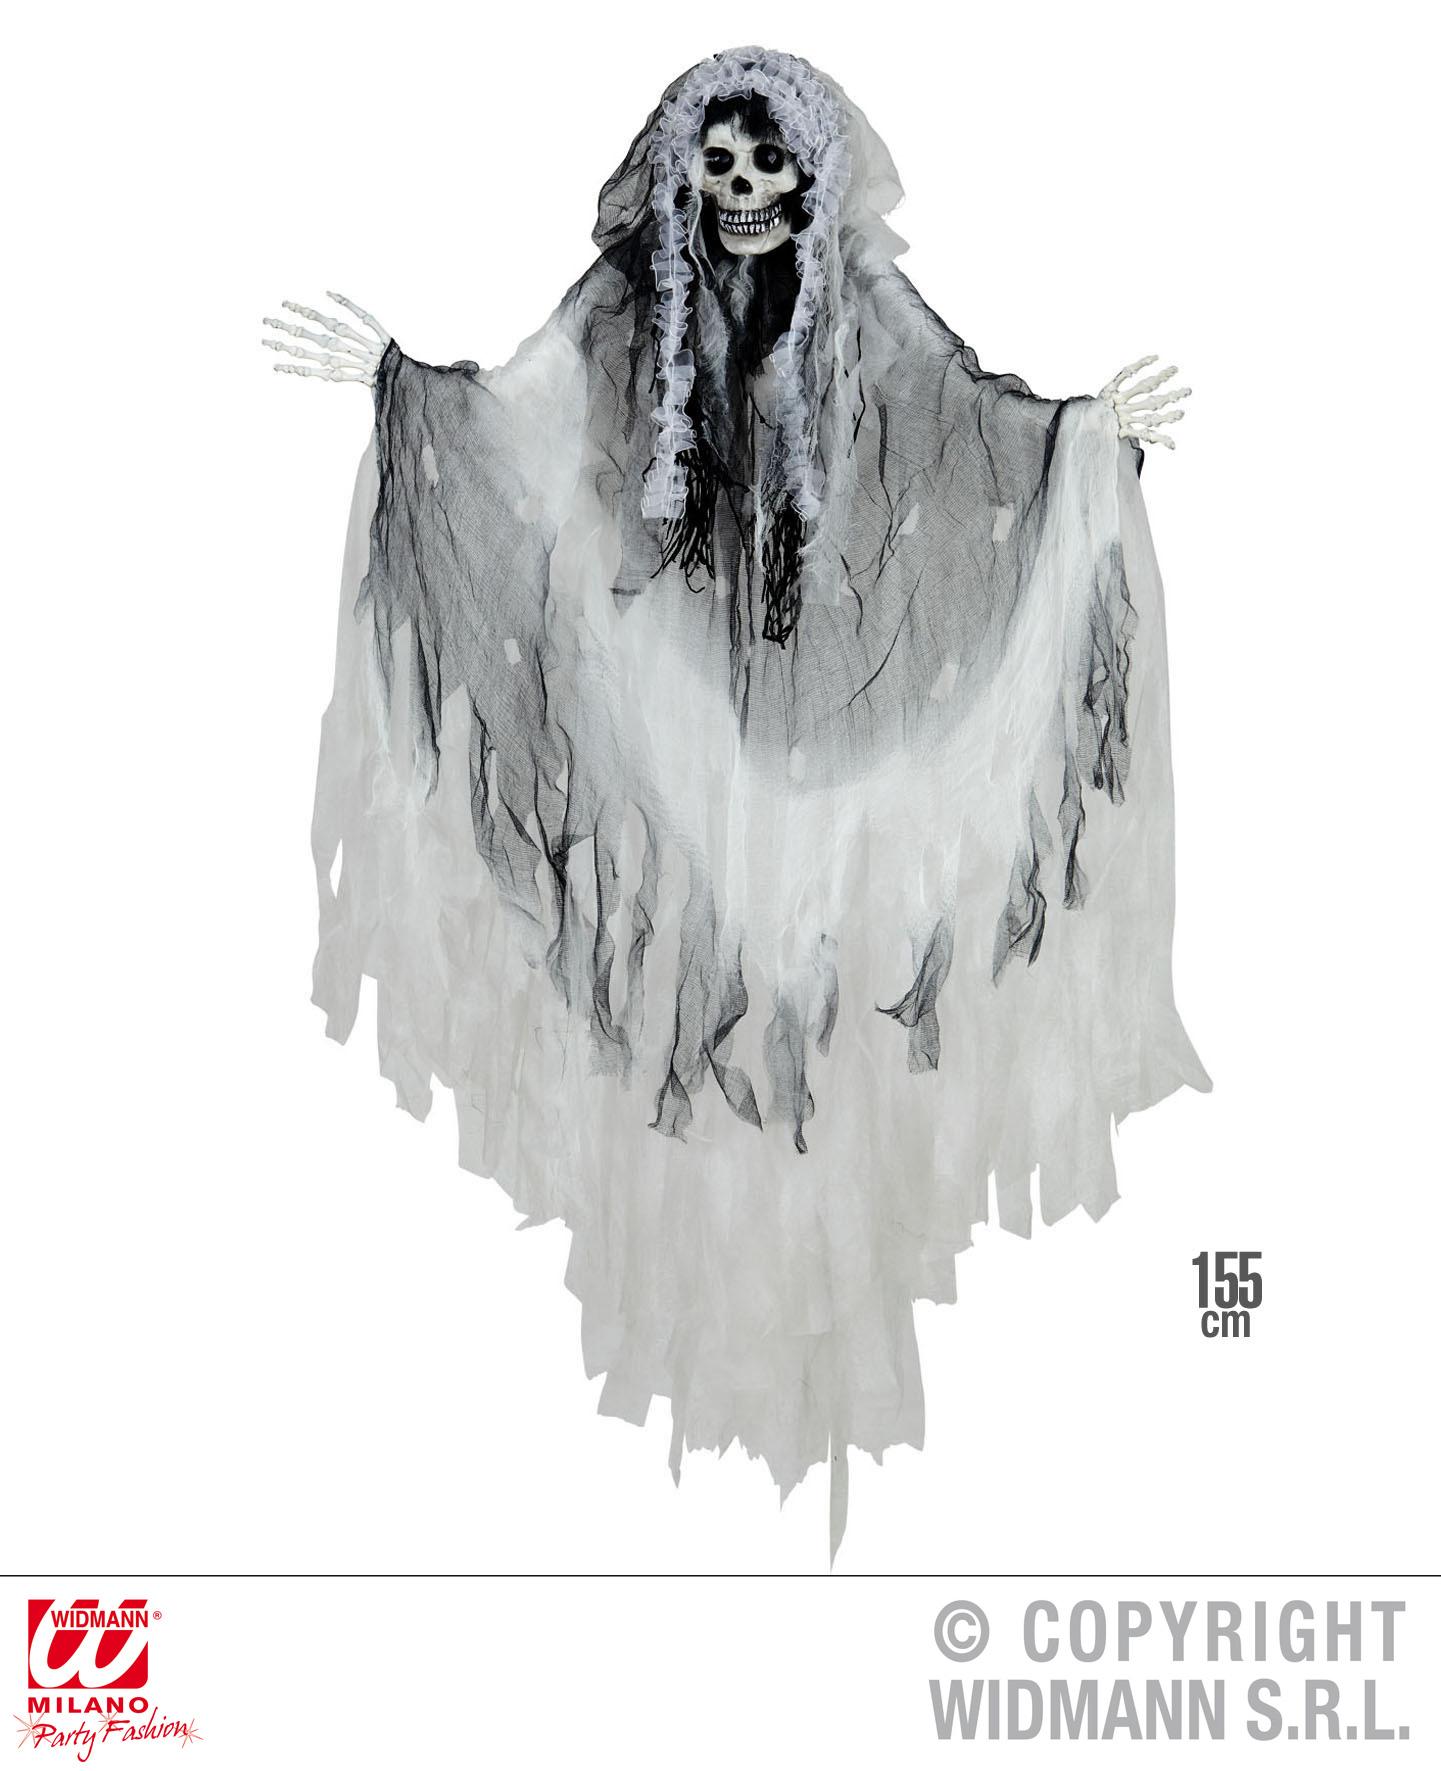 Deko Figur Tod, Skelett Braut zum Hängen 155 cm Halloween Horror 1374